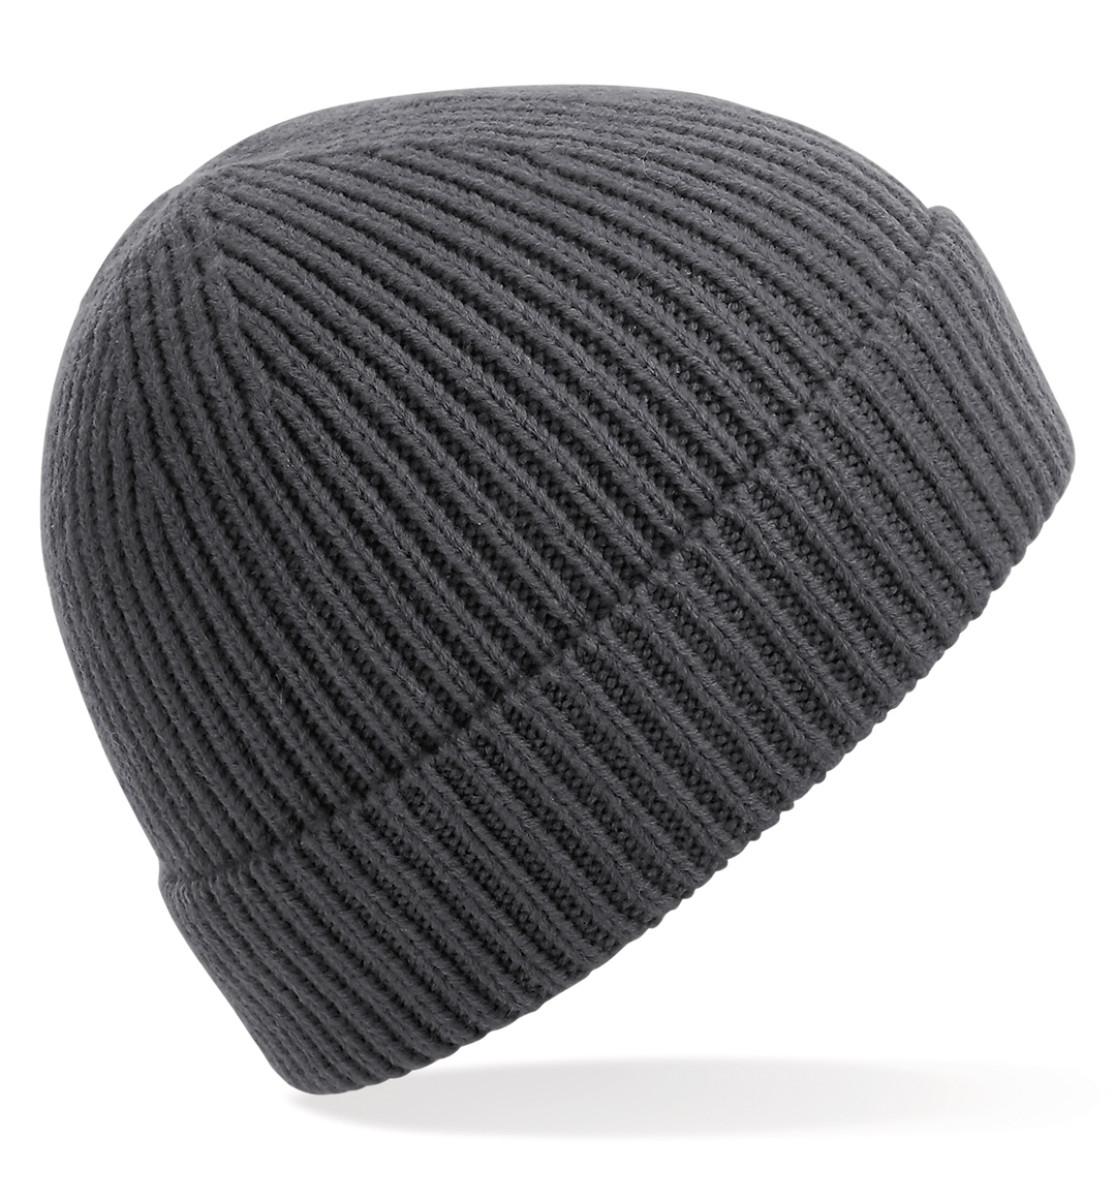 Beechfield Engineered Knit Ribbed Beanie